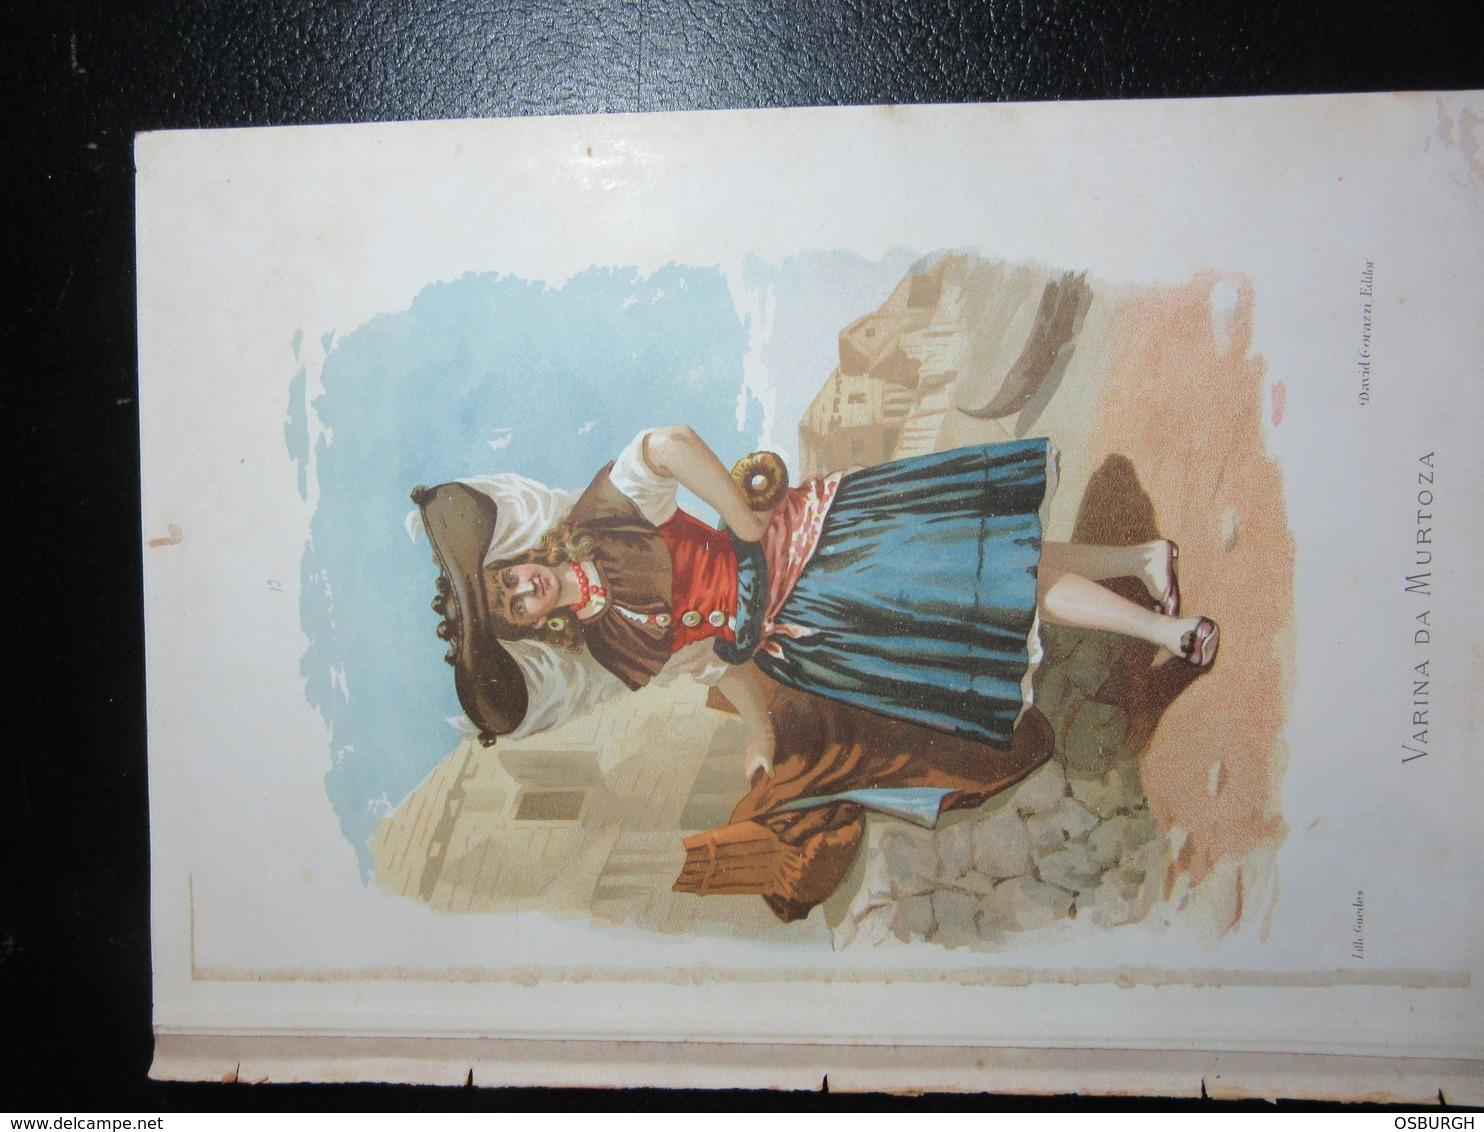 PORTUGAL. COLOUR PRINT. LOCAL COSTUMES. VARINA DA MURTOZA. TORN FROM A BOOK - Prints & Engravings